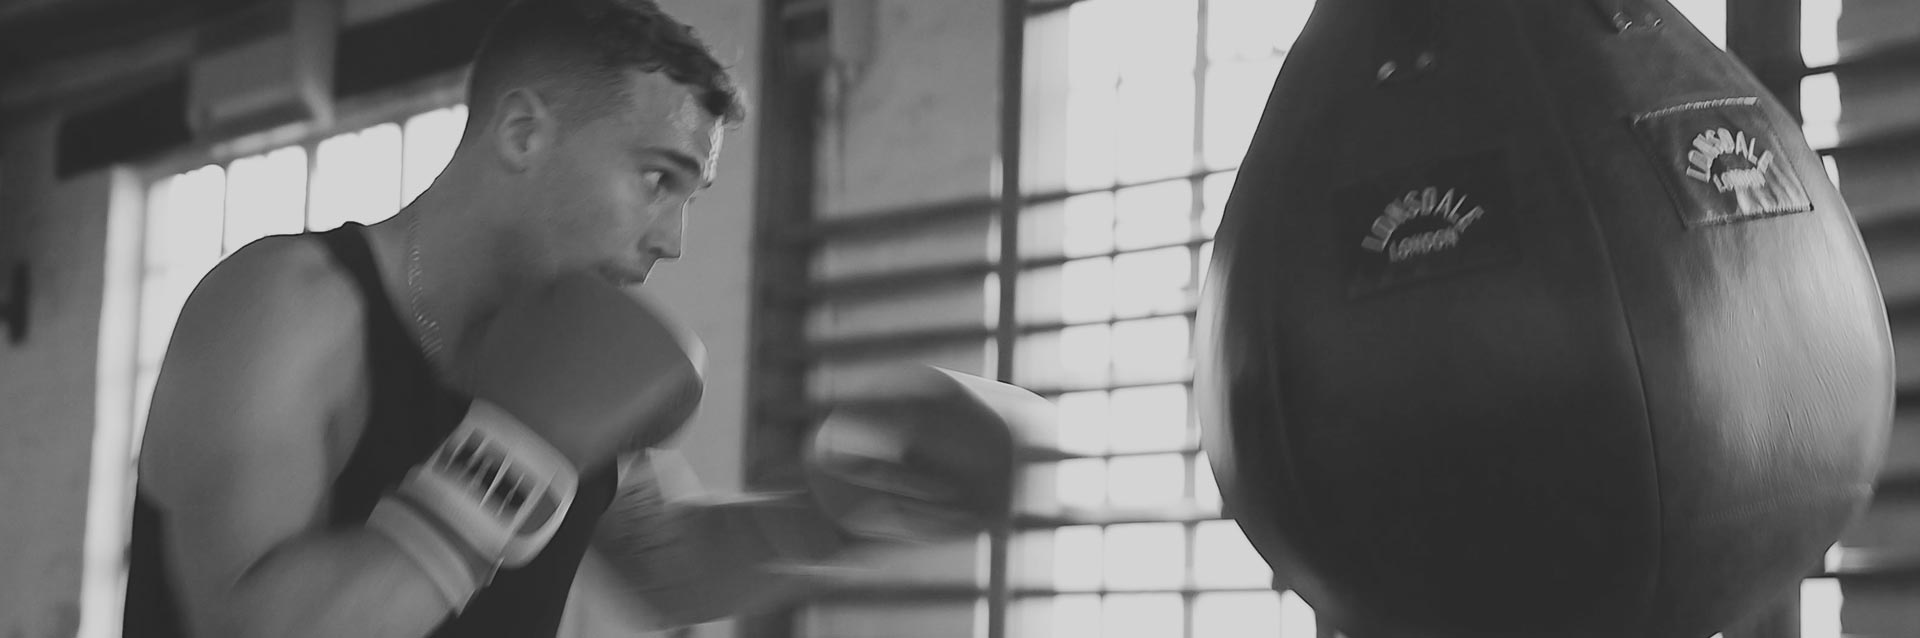 JAB Boxing Atmosphere